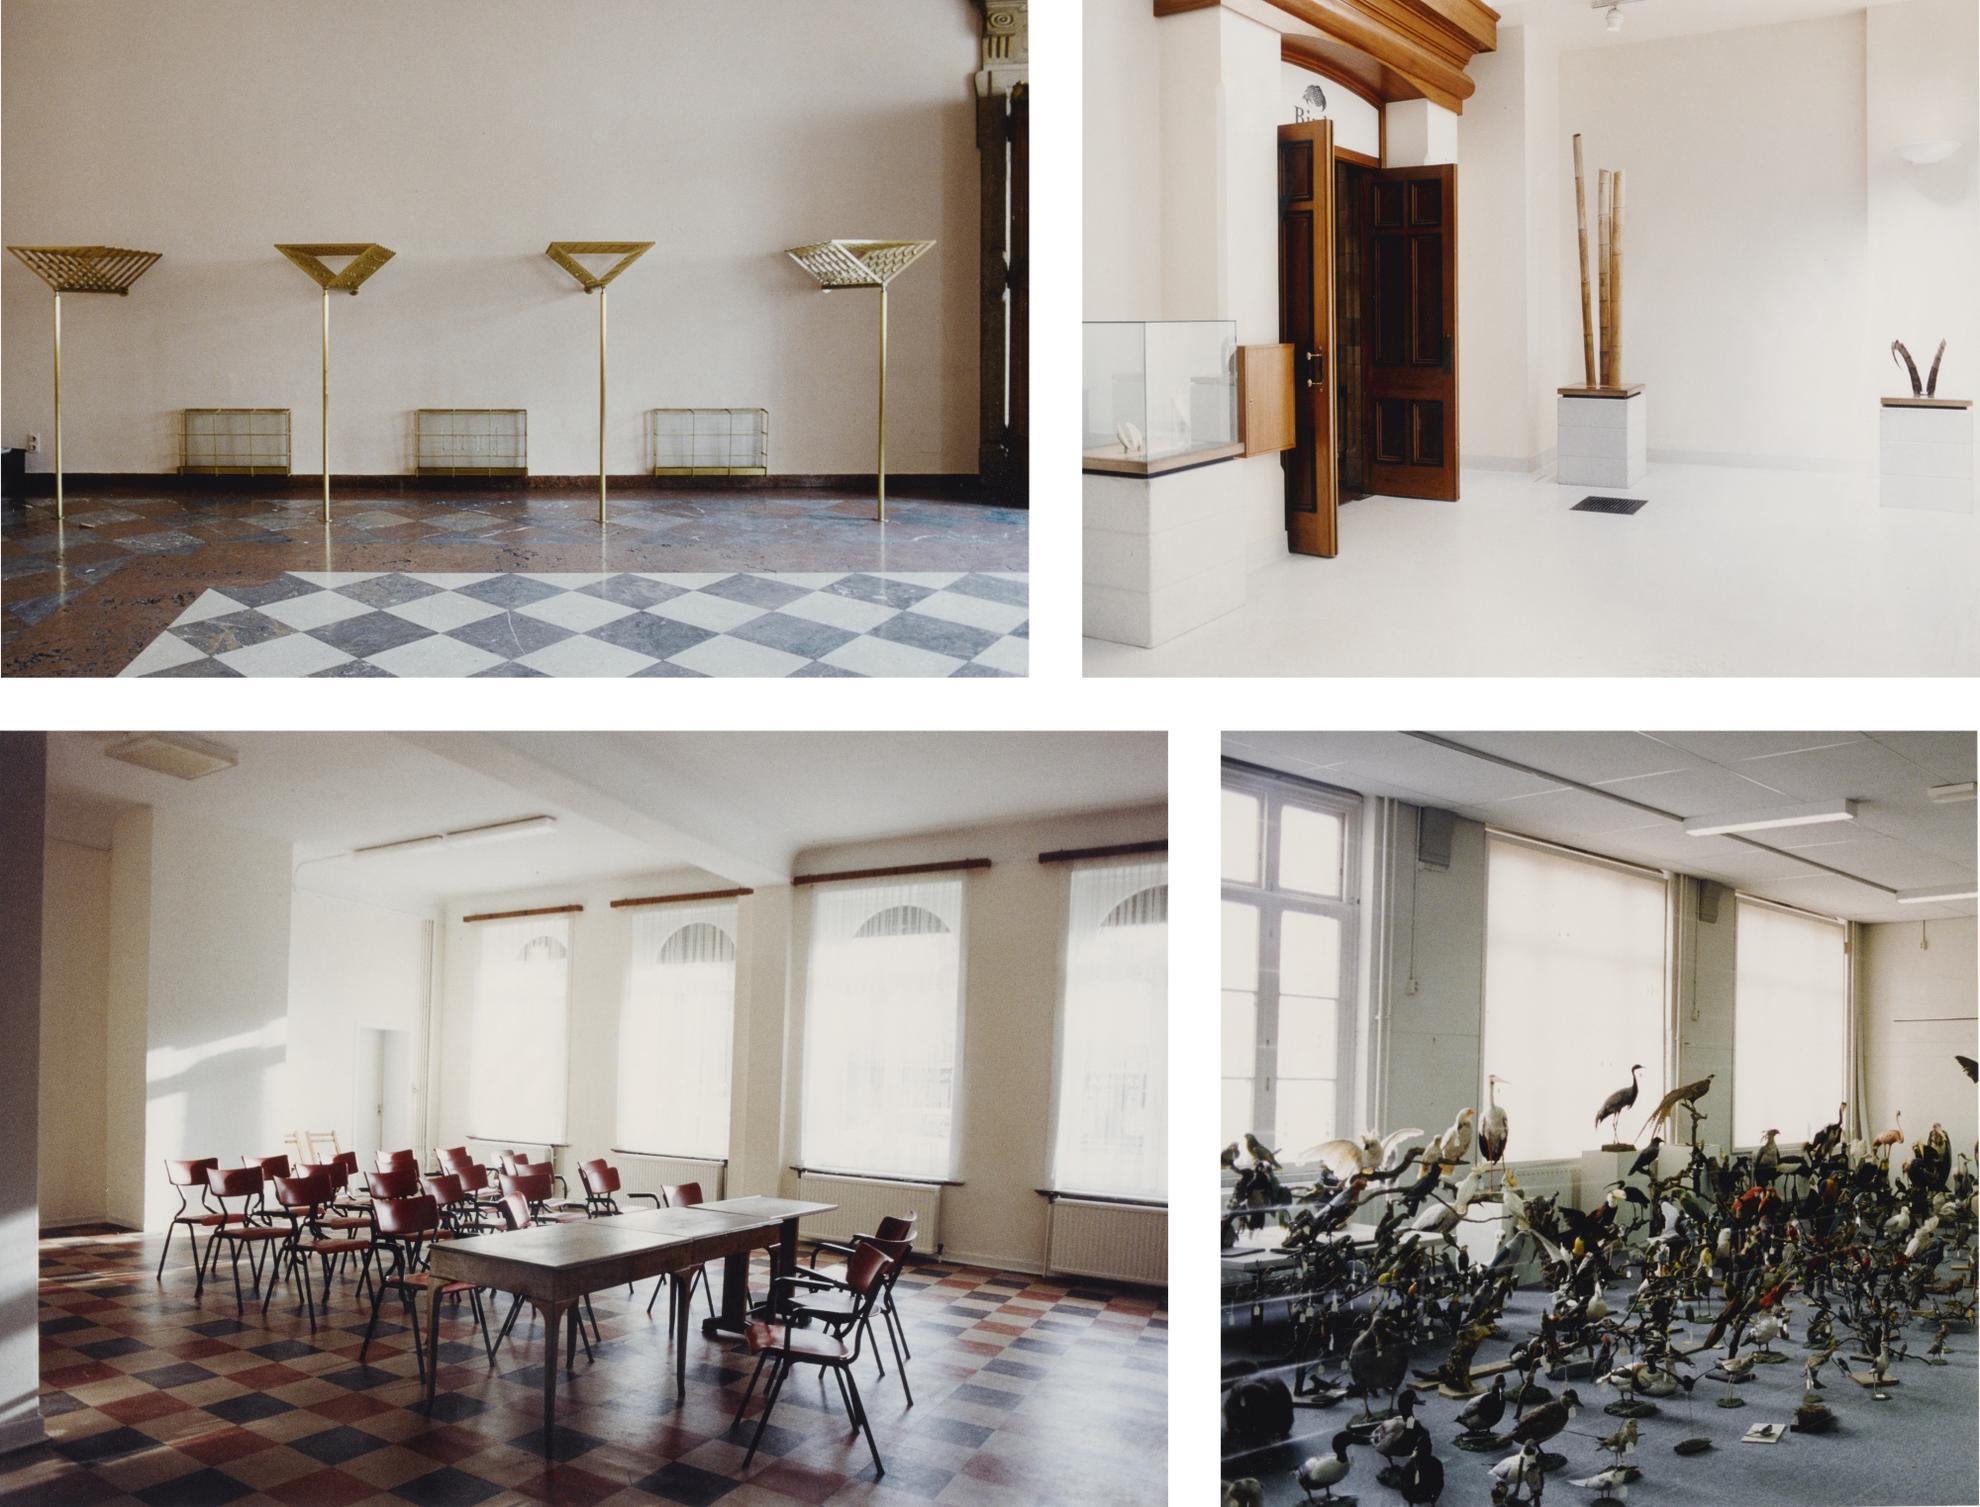 Candida Hofer-Les Heures Claires Spa I; Natural History Museum London Vi; Schloss Mirabell Salzburg Iv; And Naturkundemuseum Tilburg Iii [Four Works]-1996